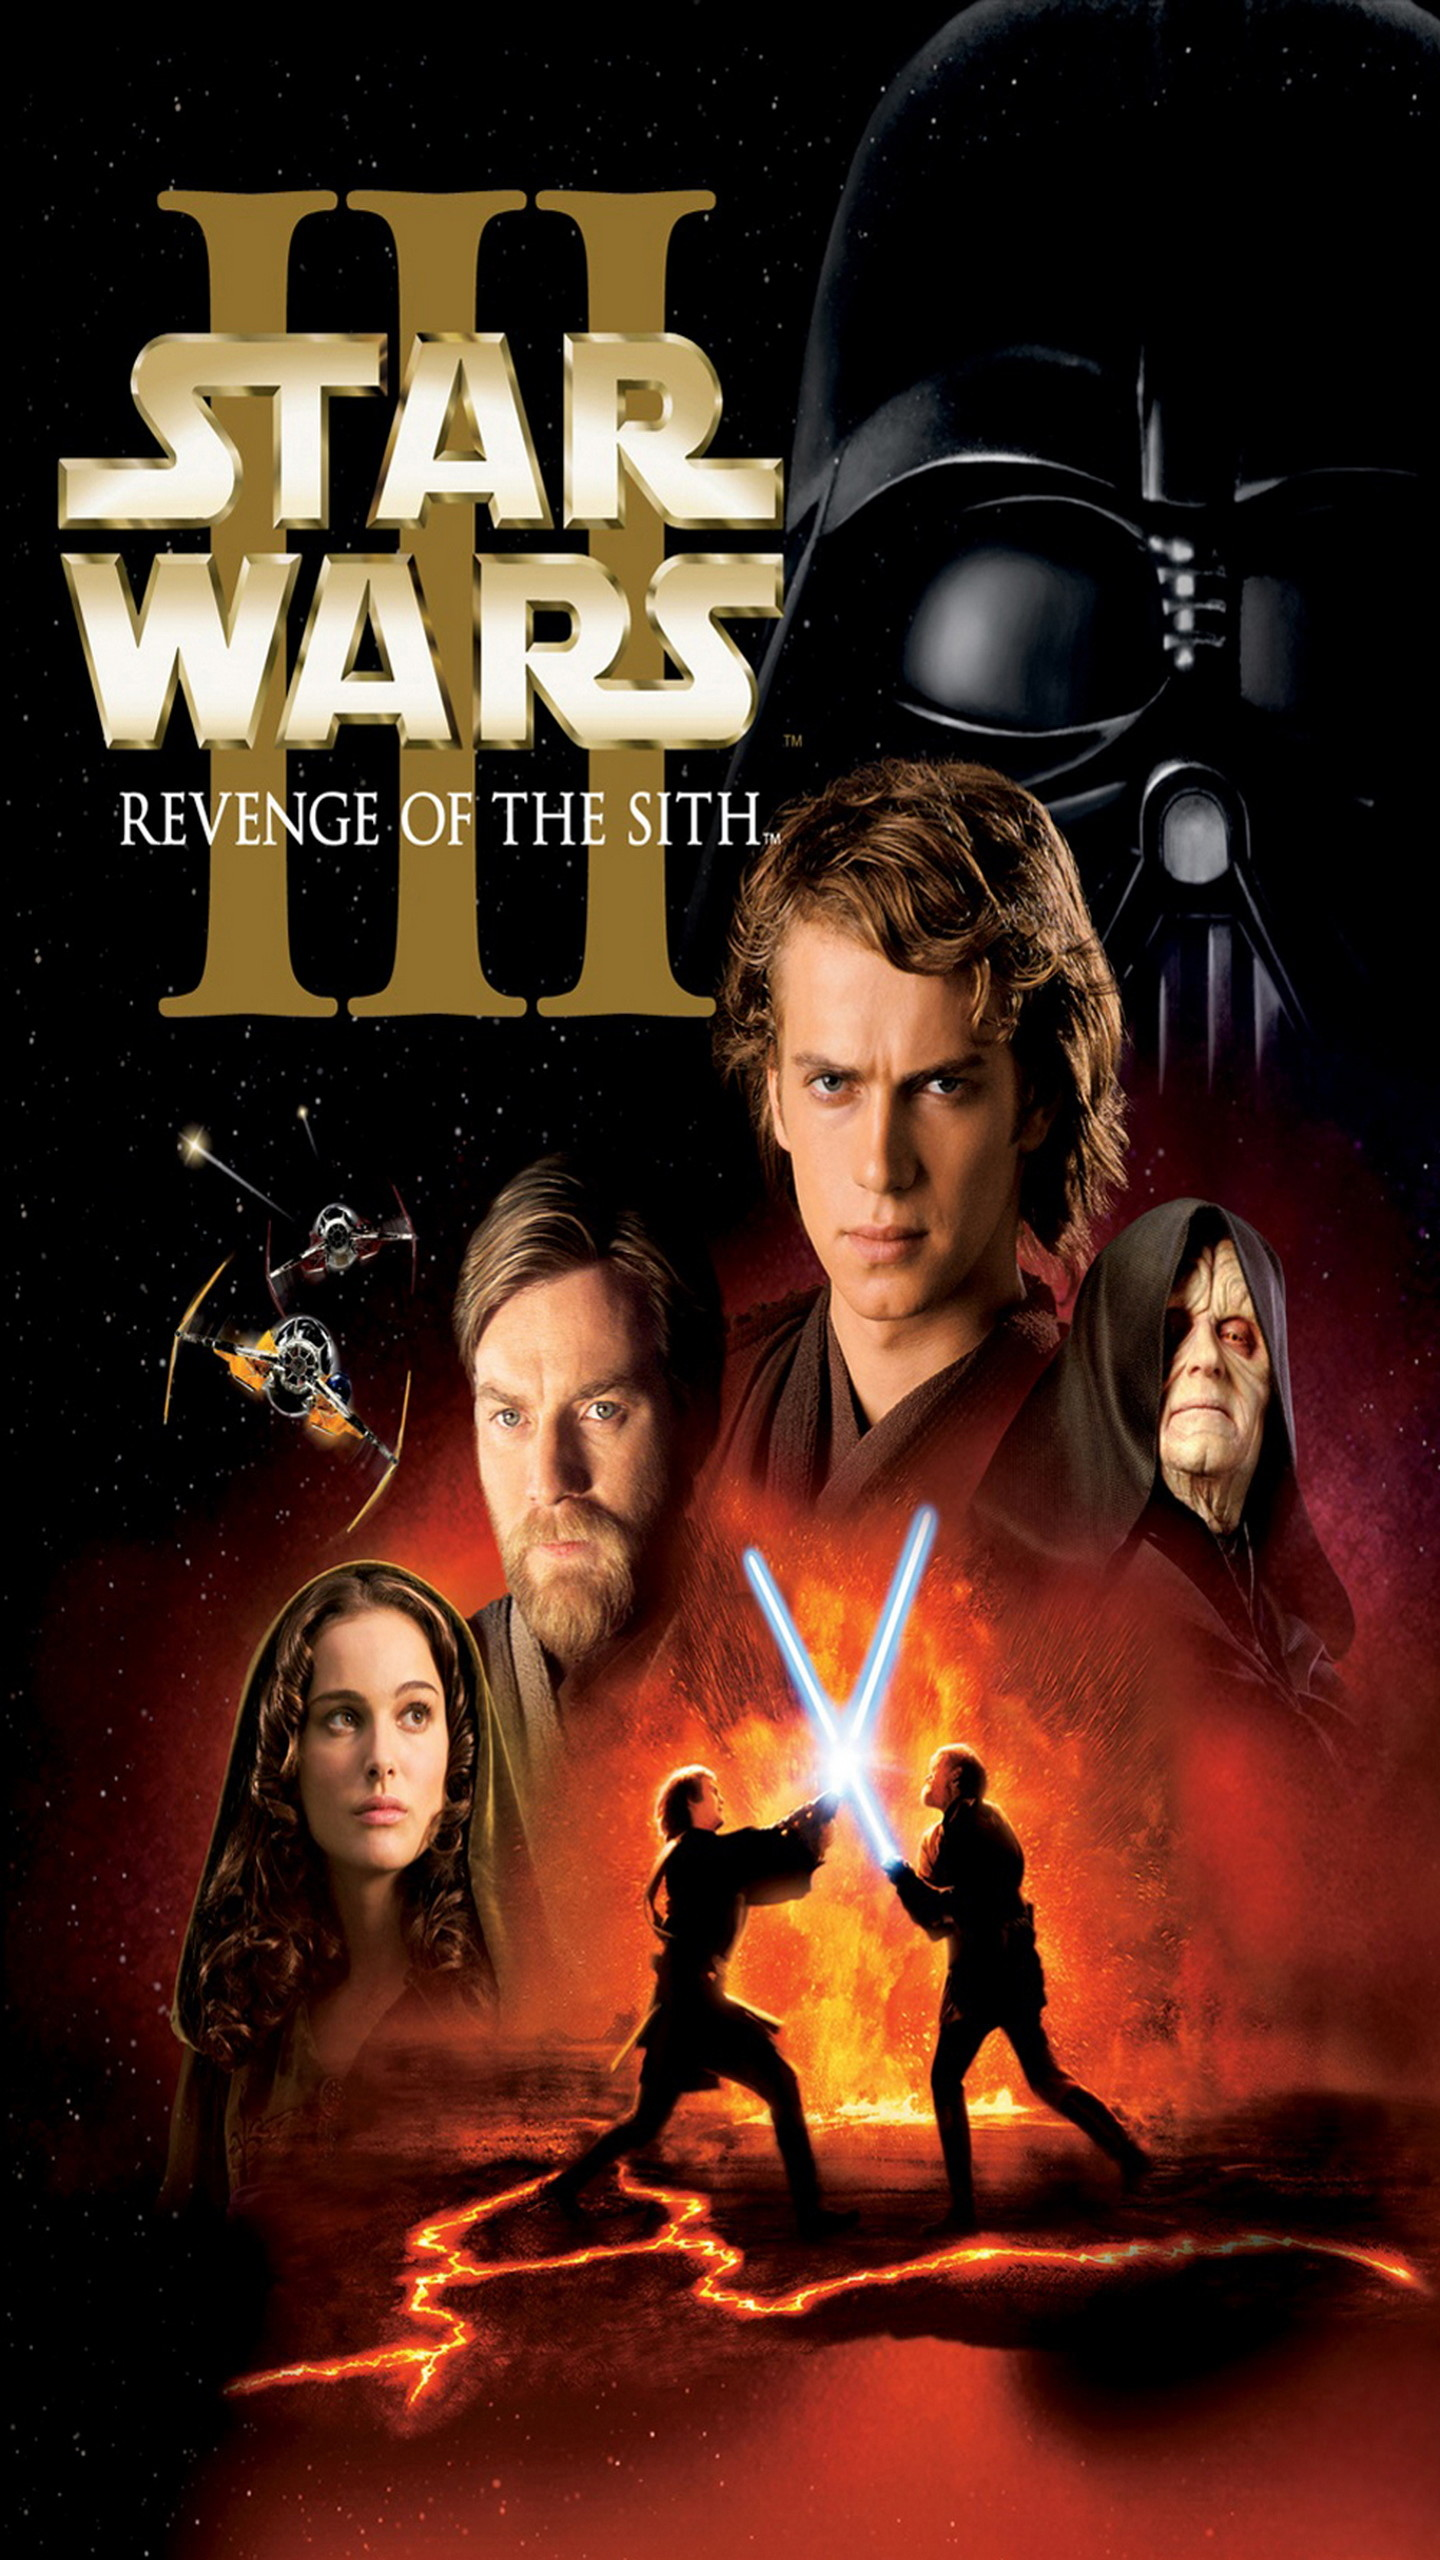 Star Wars Episode Iii Revenge Of The Sith Galaxy Note Star Wars Episode Iii Revenge Of The Sith Poster 1440x2560 Wallpaper Teahub Io